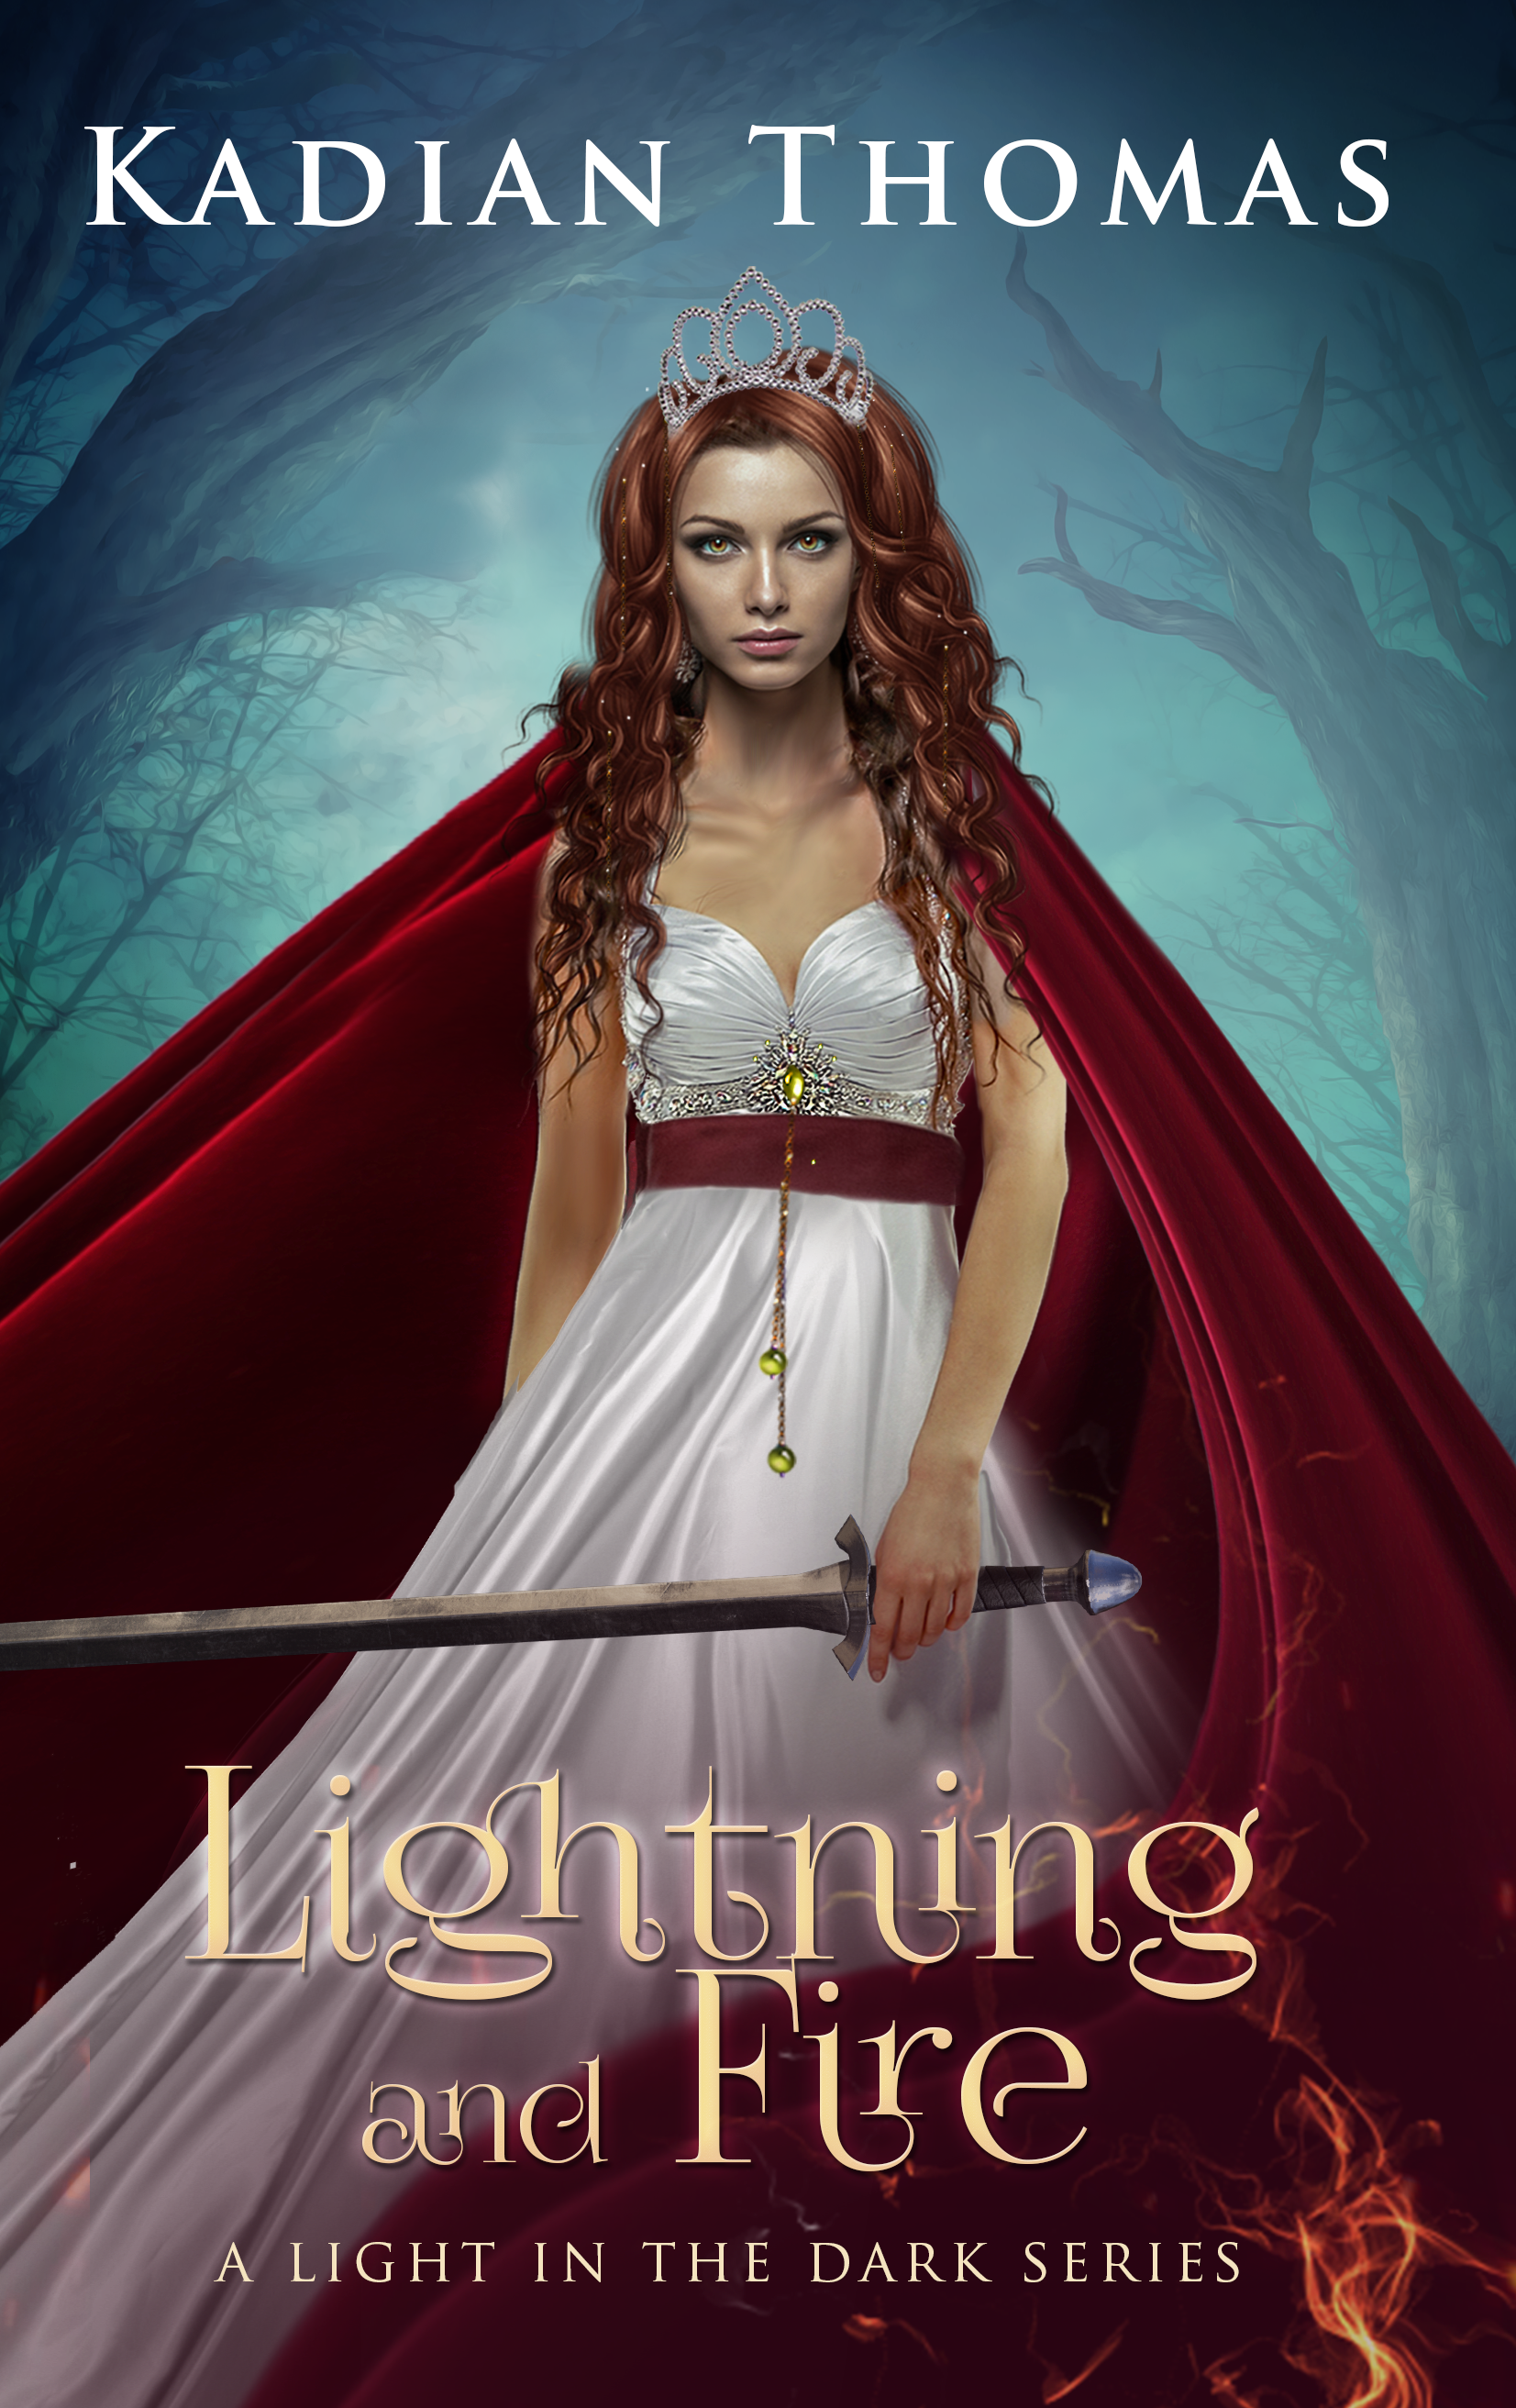 Author Kadian Thomas needs a kickass book cover for her next book Lightning and Fire.